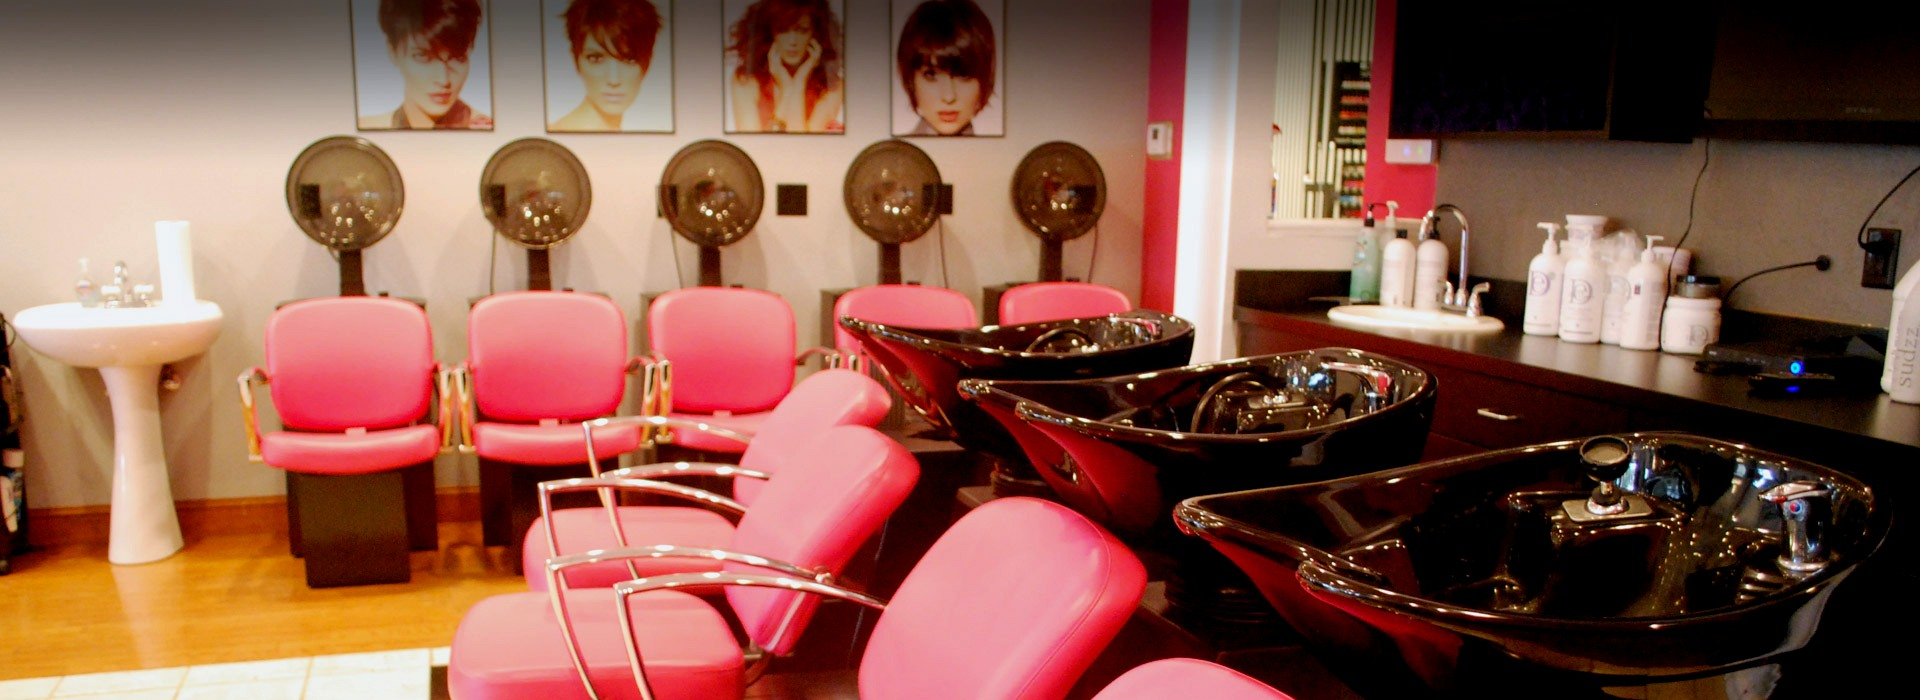 Salon Equipment Ideas & Interior Design Portfolio: Buy-Rite Beauty